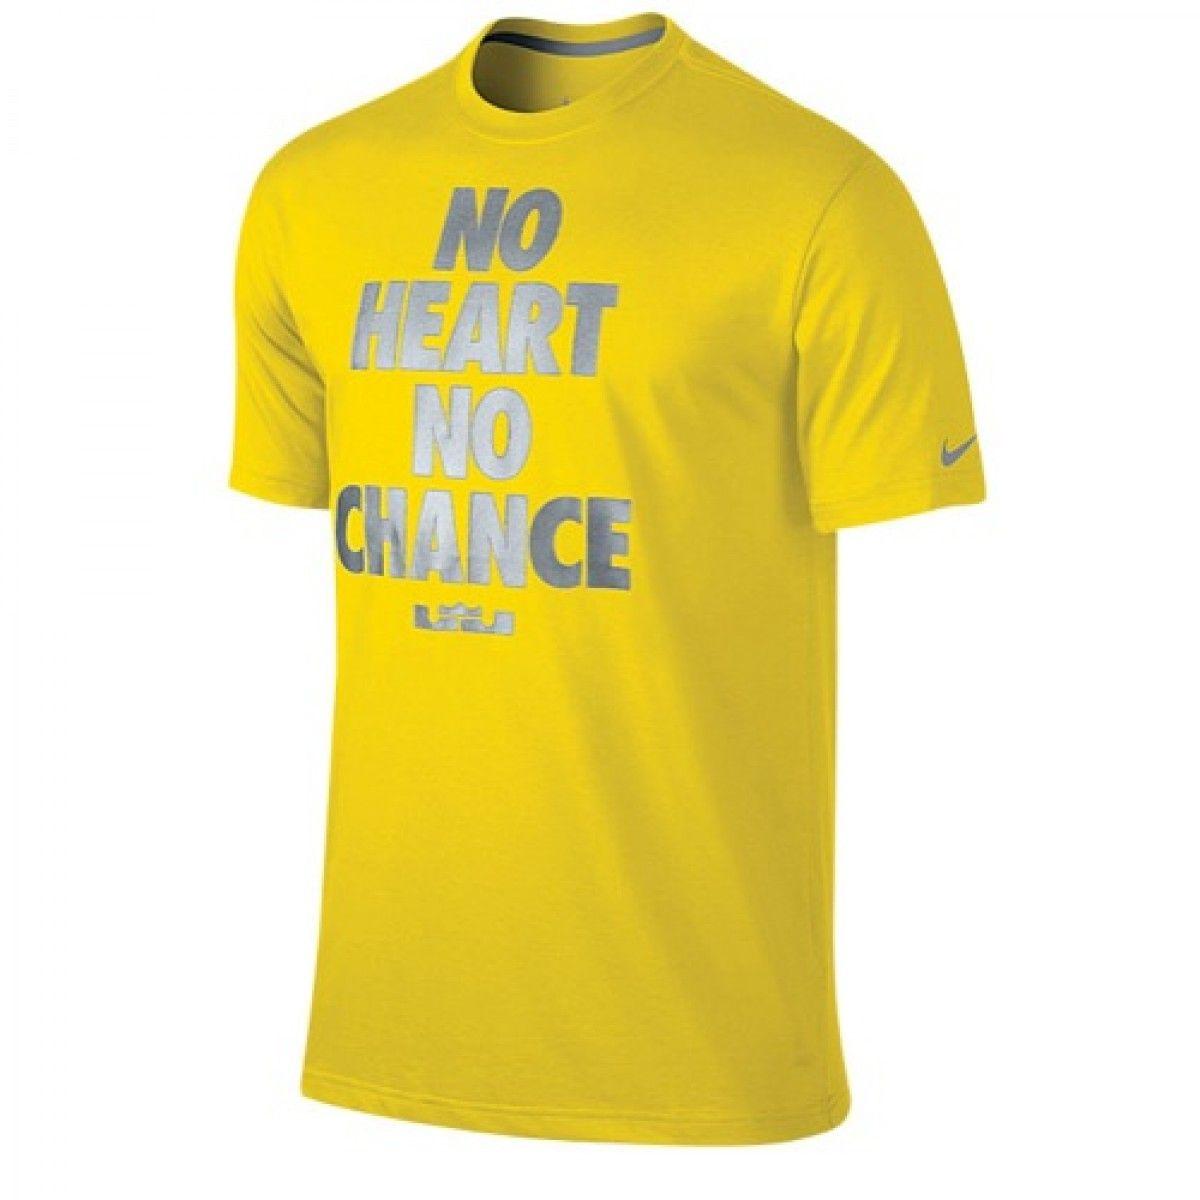 nike shirt sayings